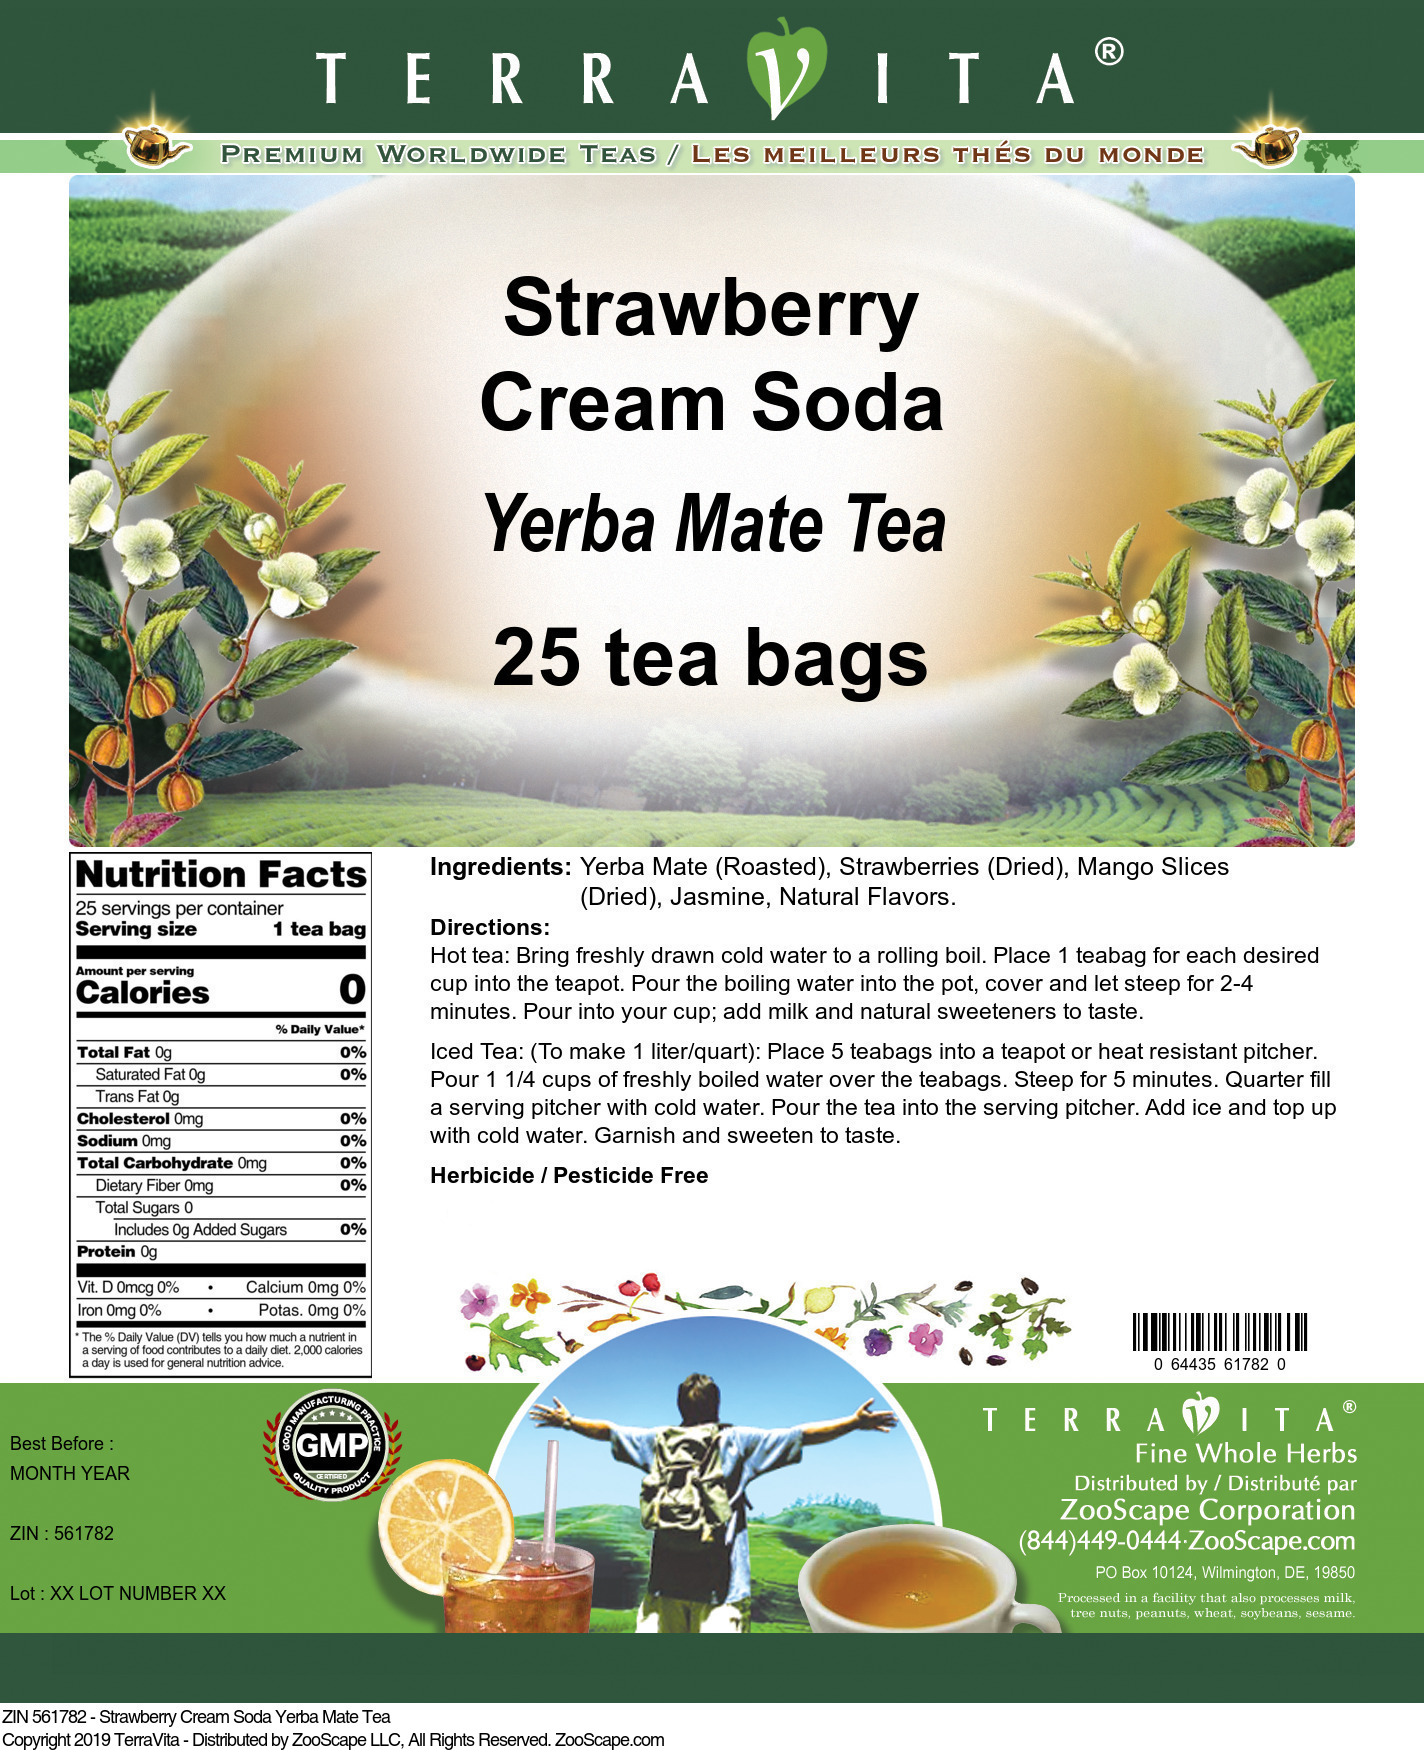 Strawberry Cream Soda Yerba Mate Tea